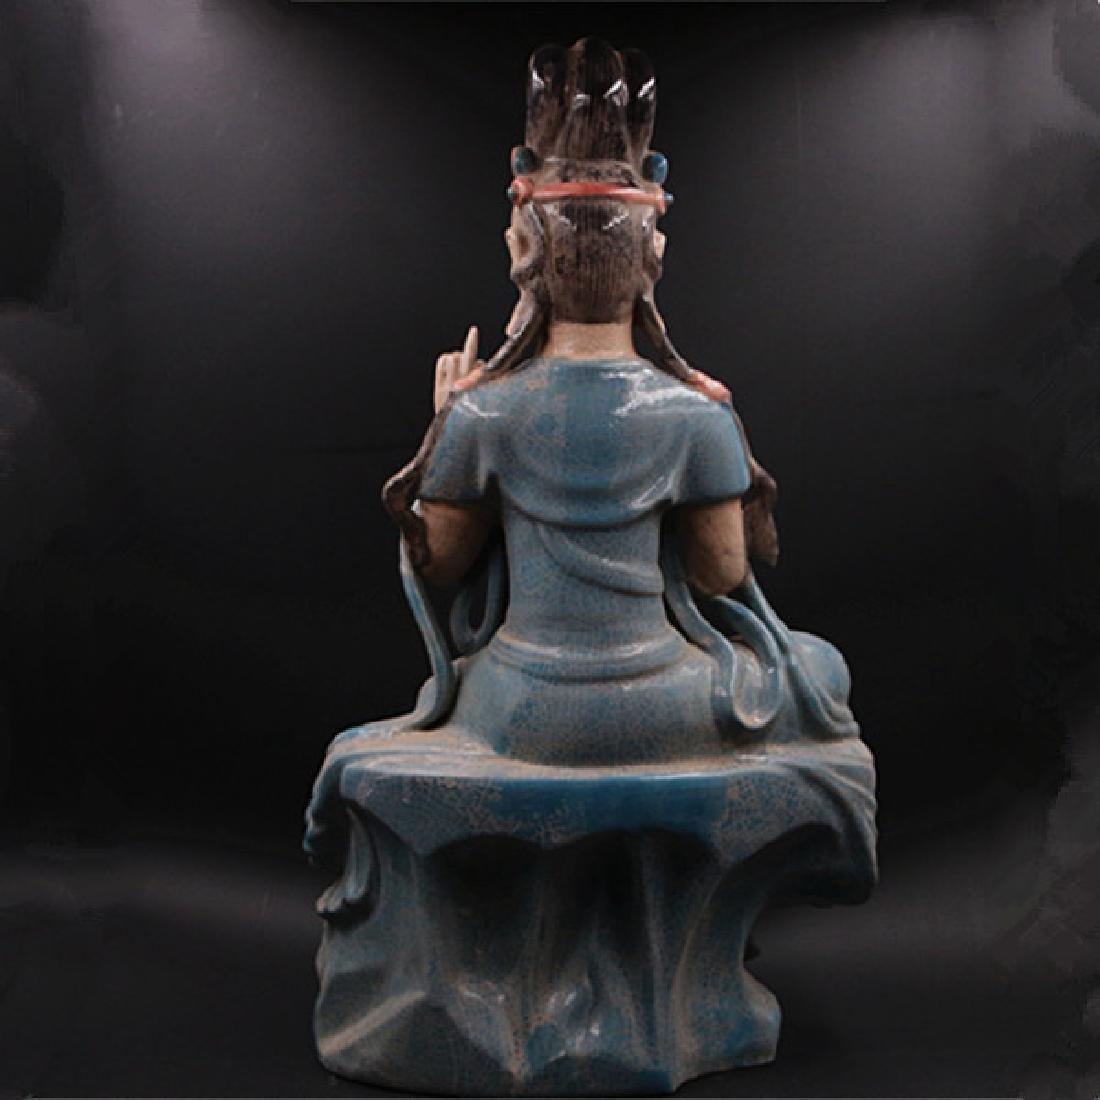 Chinese Zhou Dynasty Chai Ware Porcelain Buddha Statue - 3